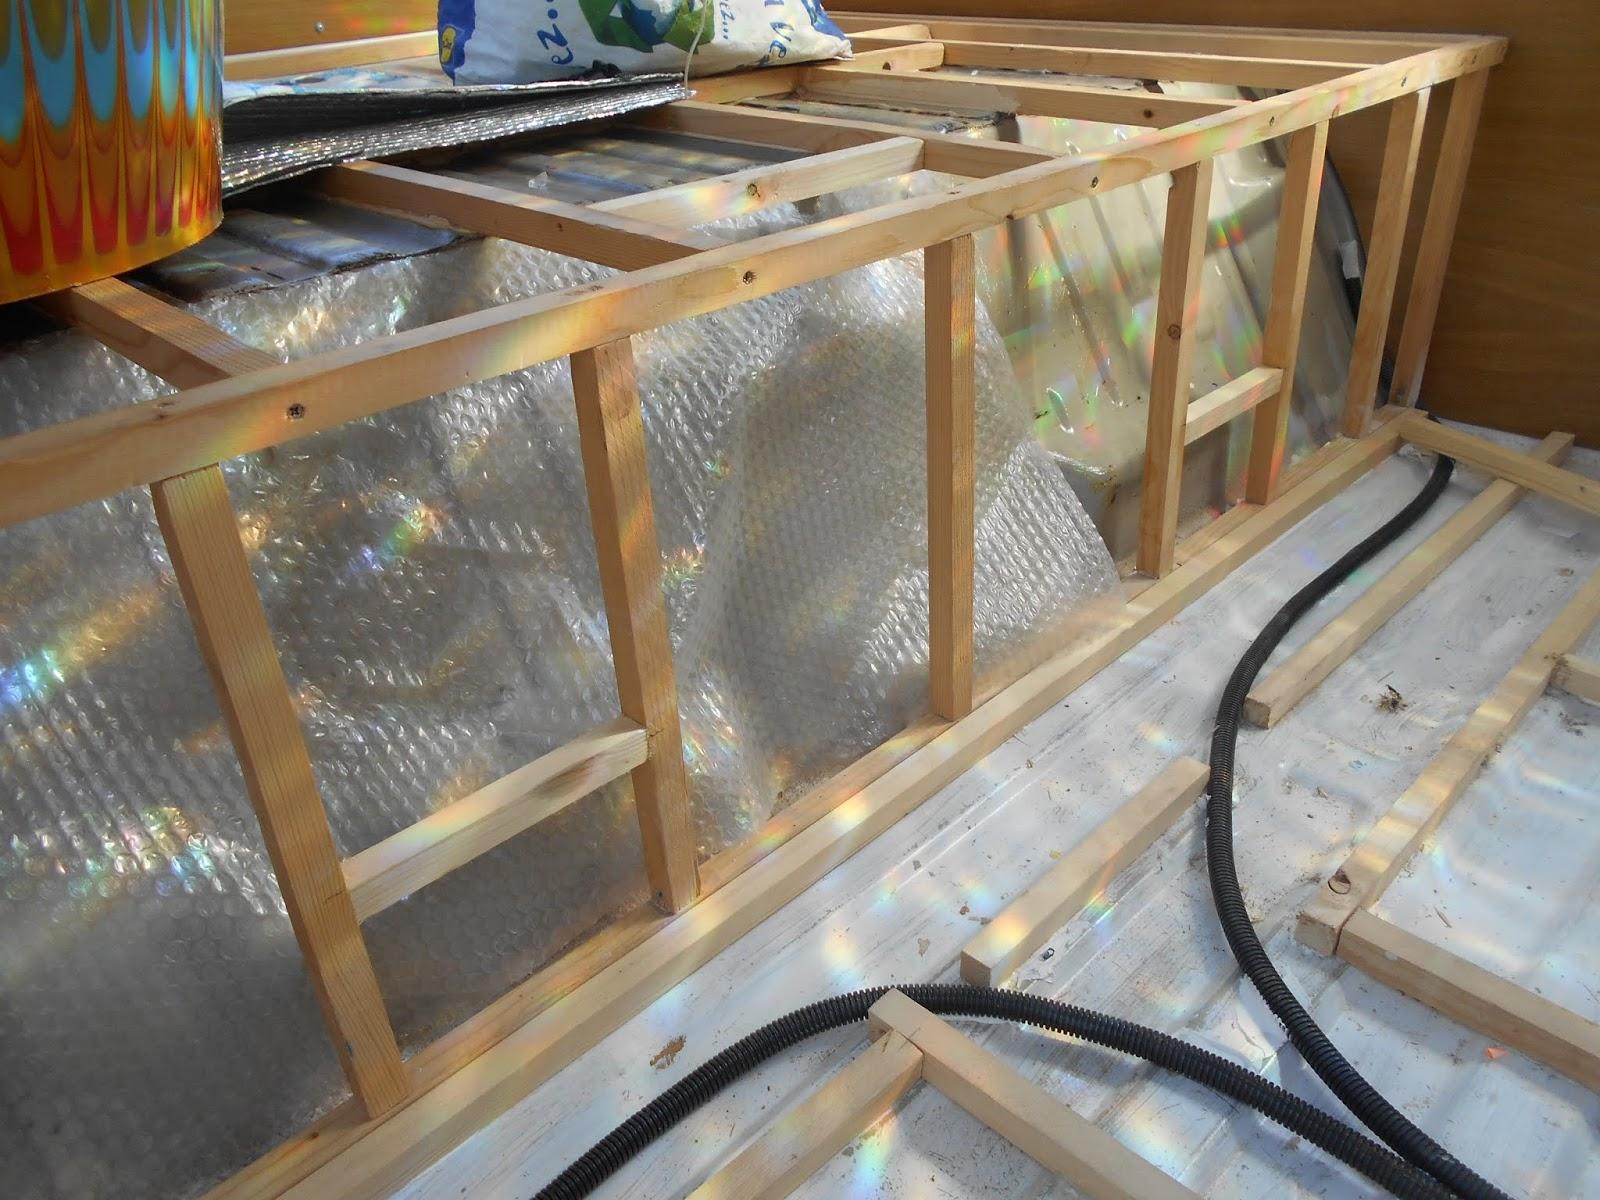 BohemiVan: VANLIFE - Fitting a Campervan Subfloor and Lino